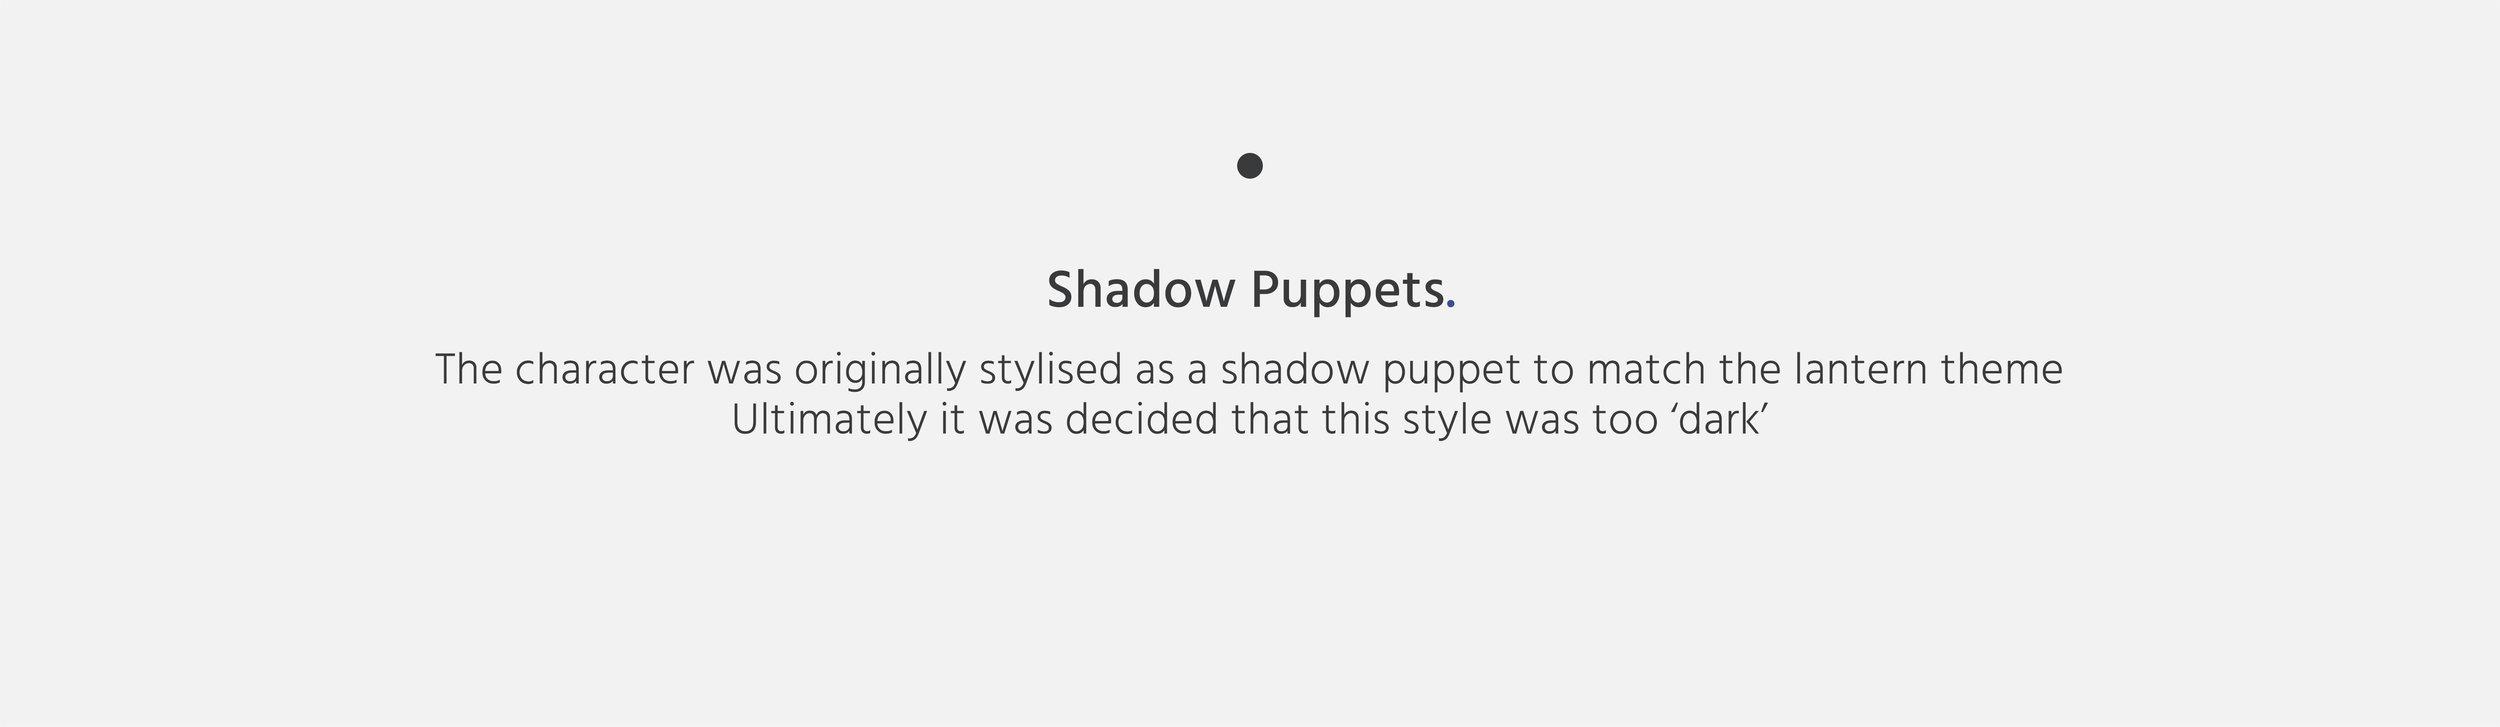 TextBlock_ShadowPuppets.jpg